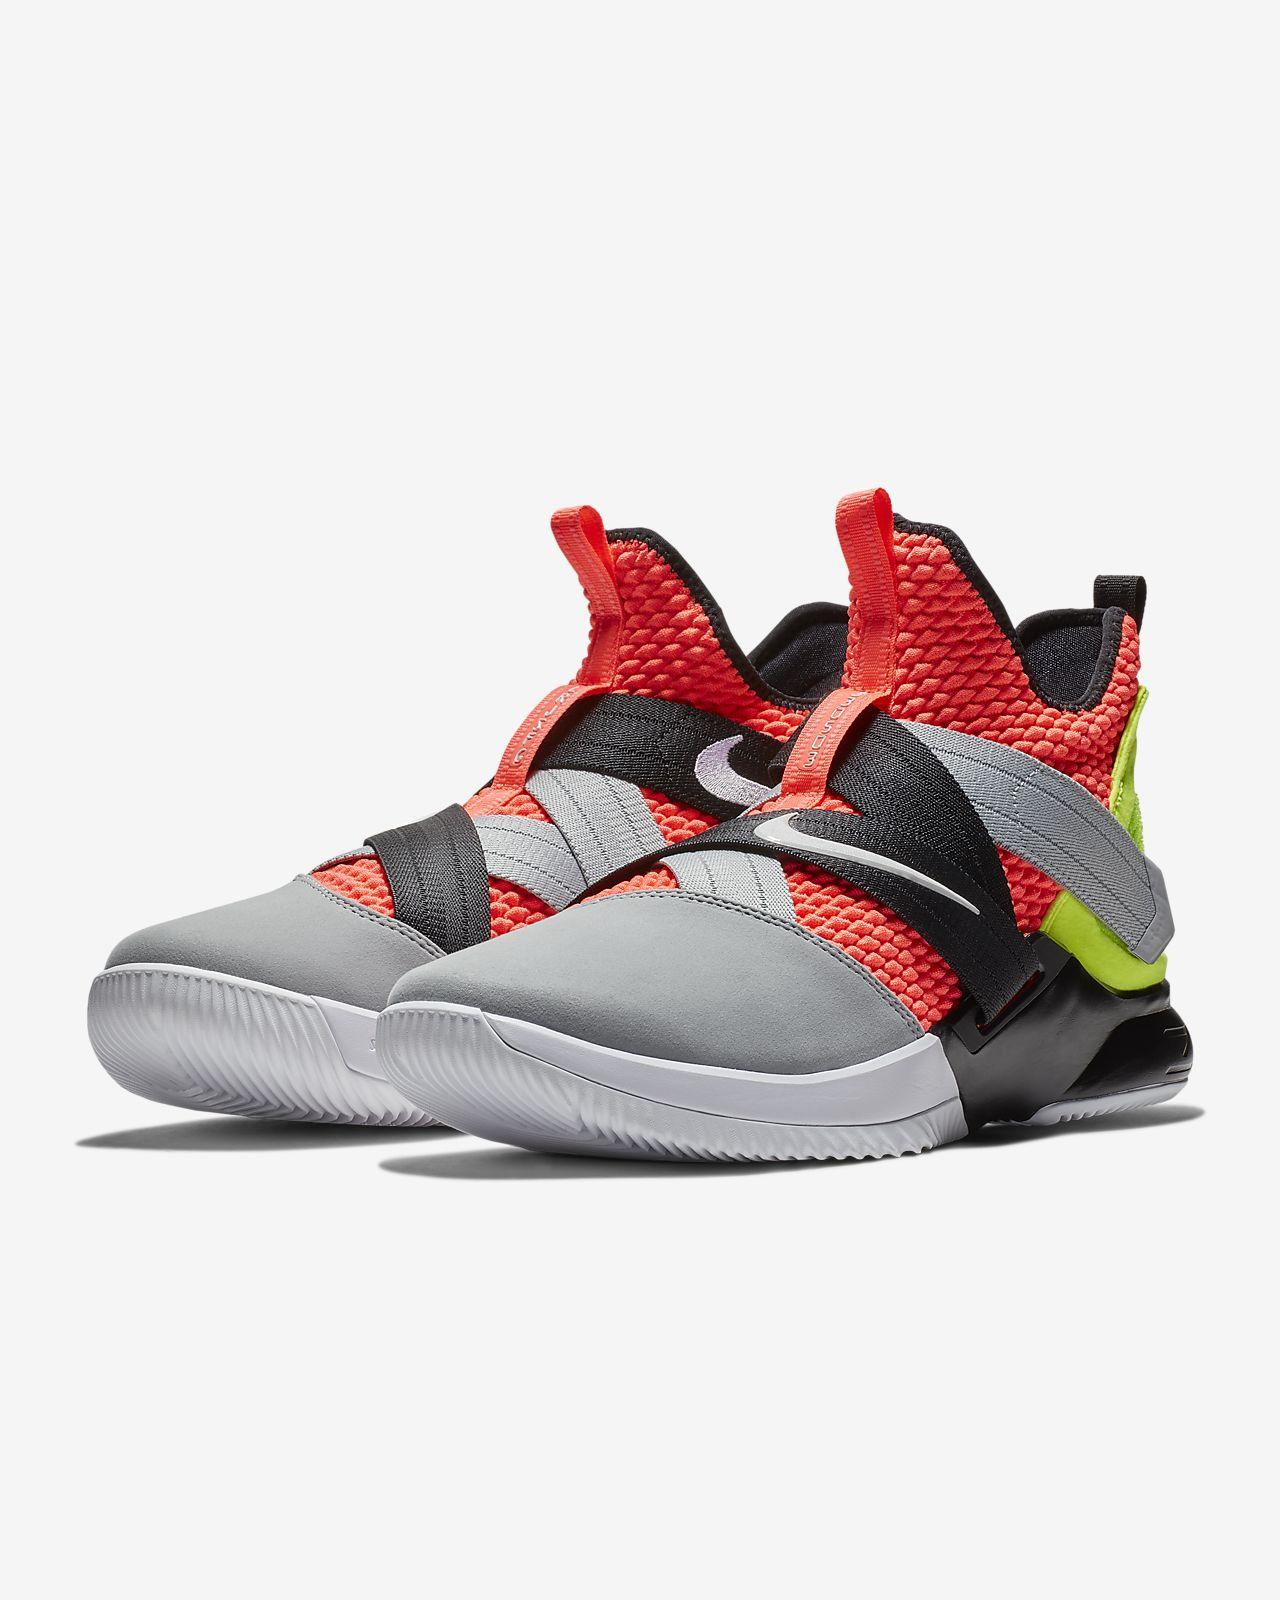 a8c747ad3855 LeBron Soldier 12 SFG Basketball Shoe. Nike.com